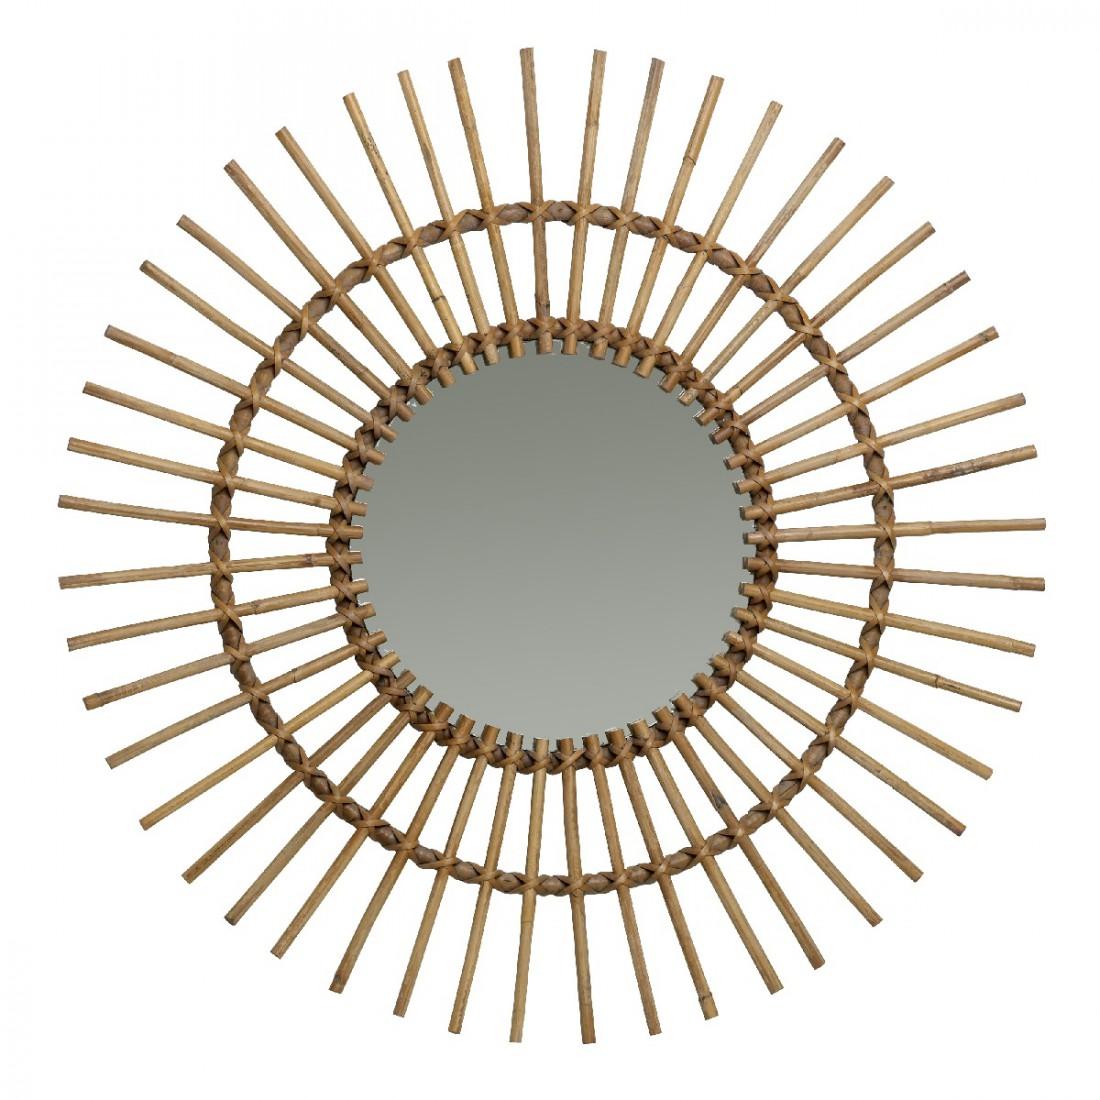 Miroir rotin naturel vintage soleil for Miroir soleil osier